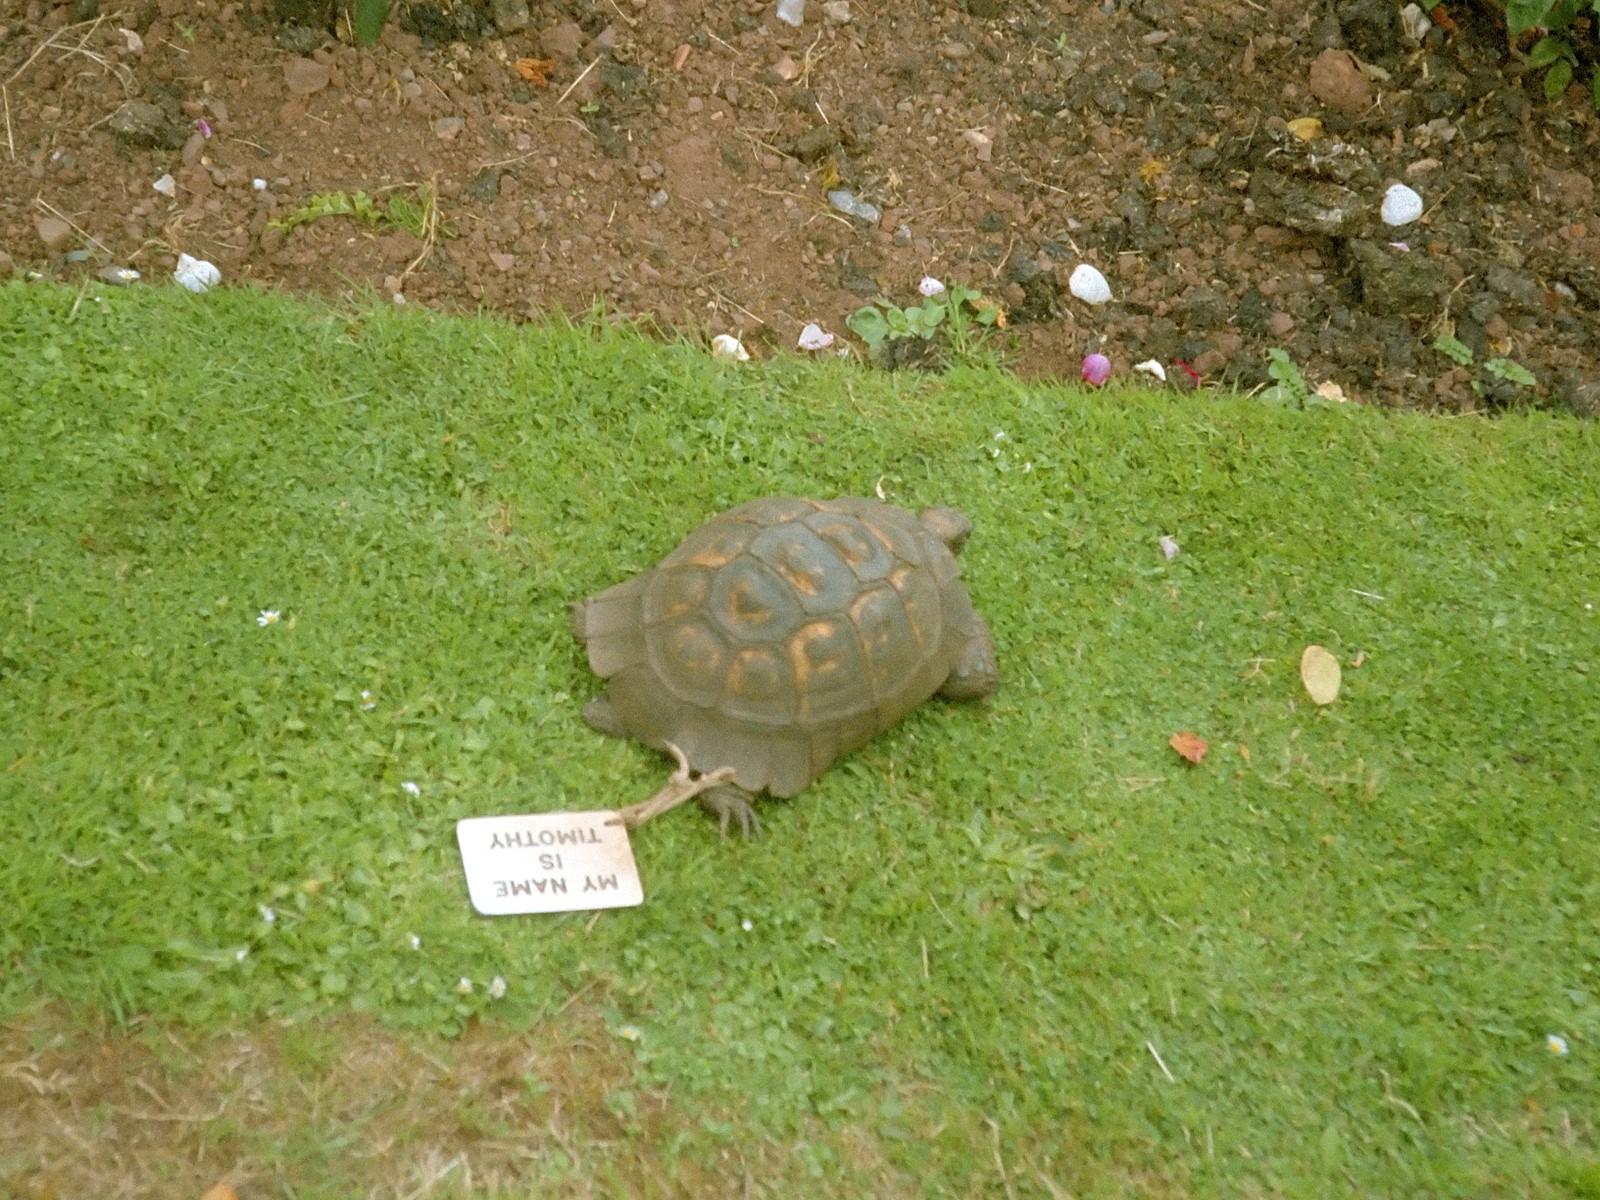 Timothy the Tortoise. Berühmte Schildkröten auf Villa Amanda der Schildkrötenblog